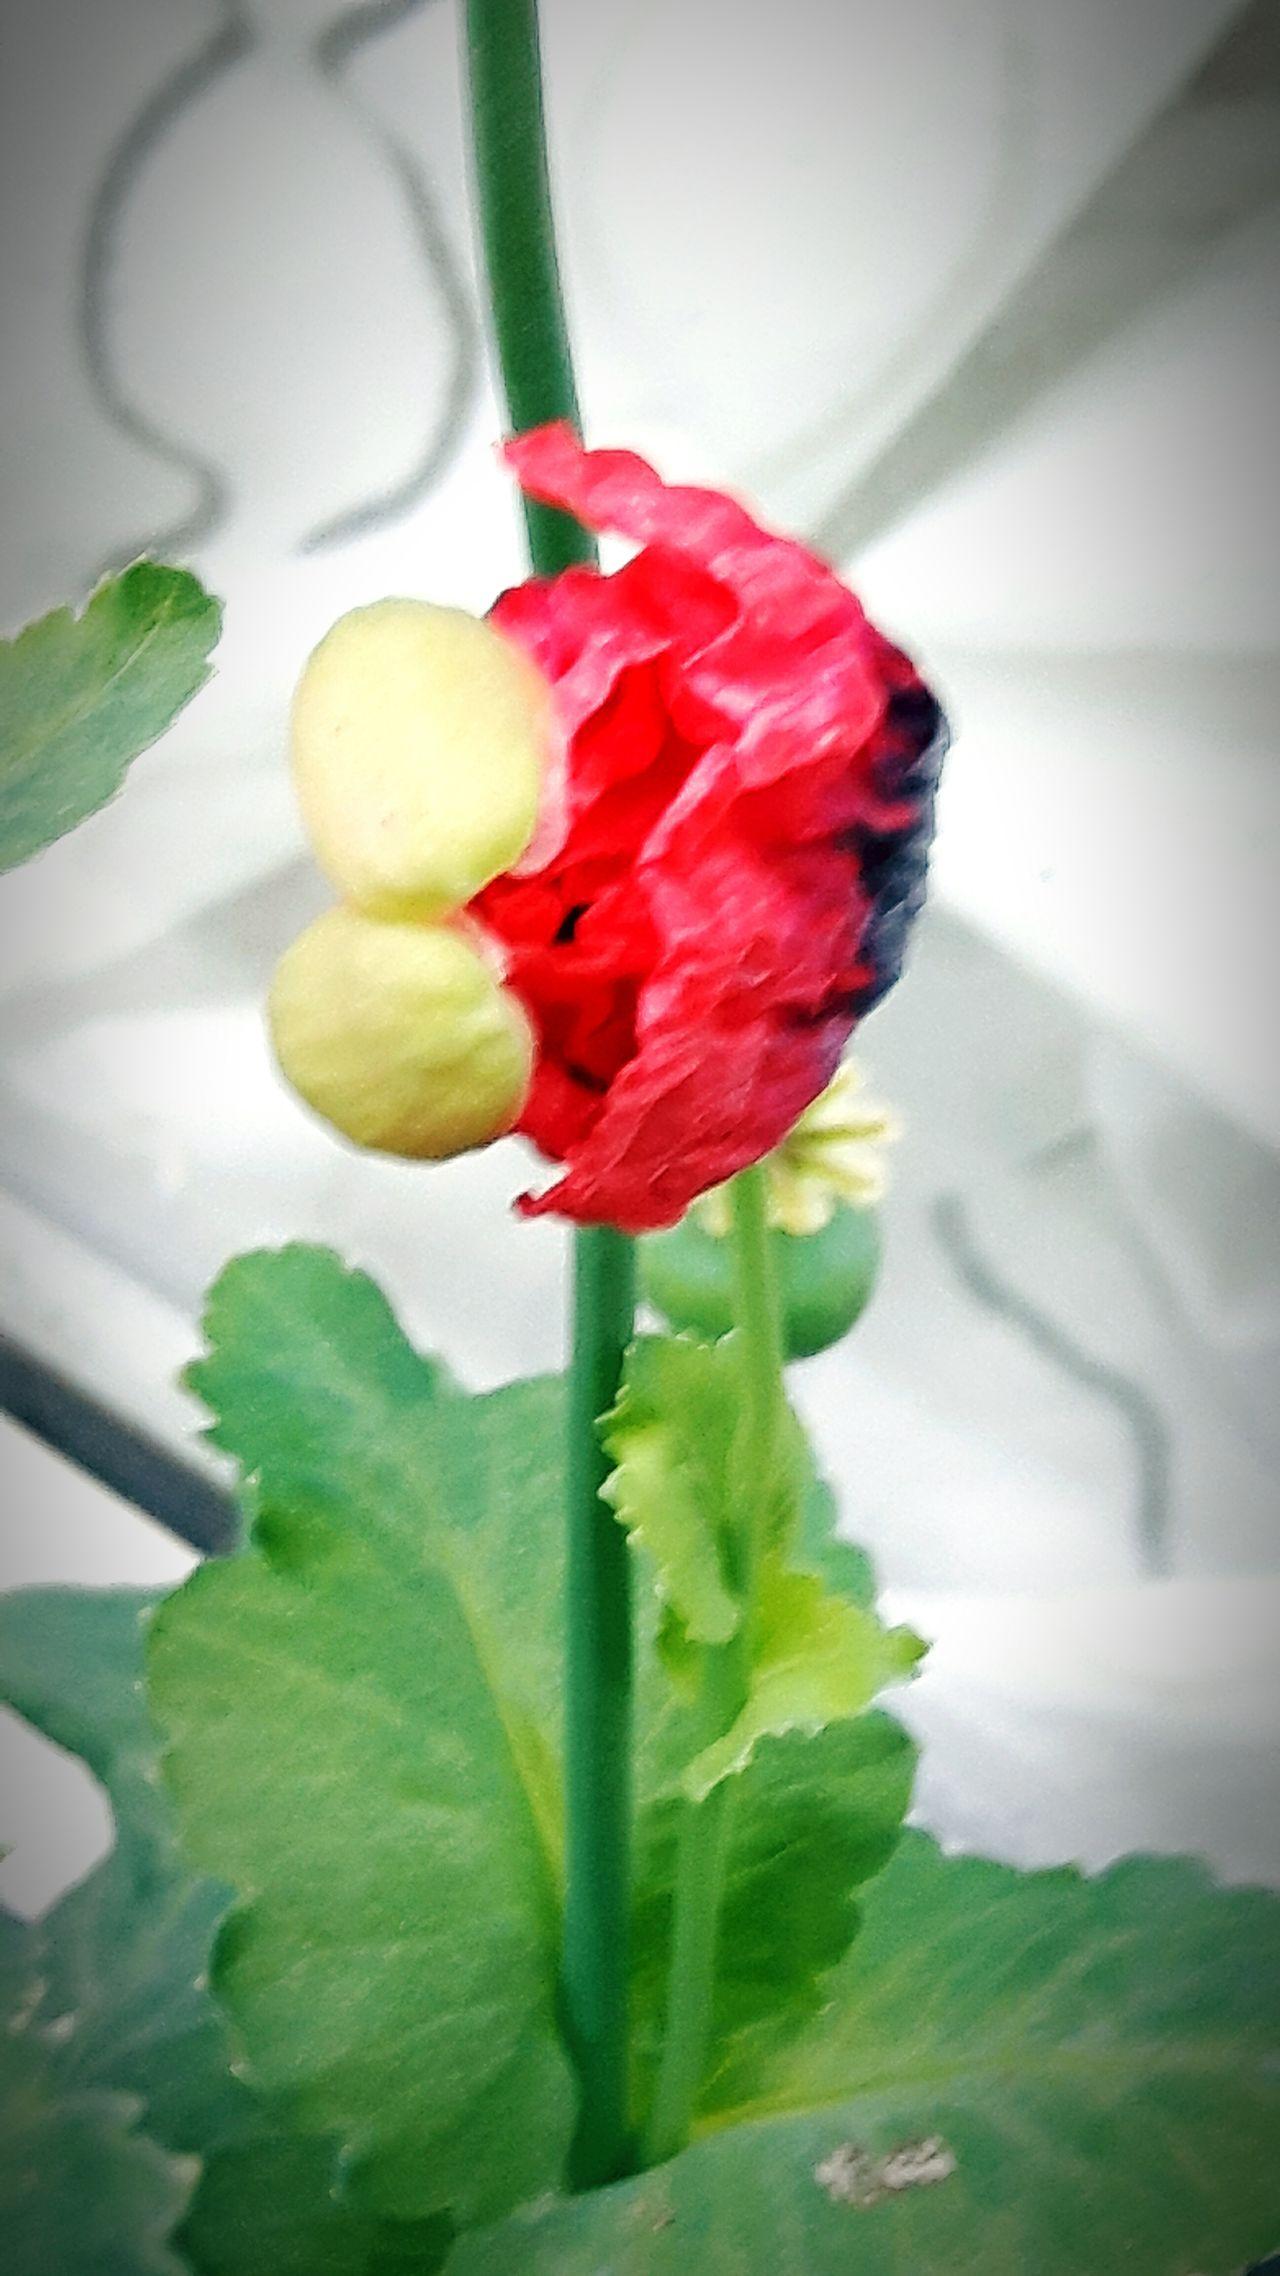 A Little Touch Of Color Poppy Flower Poppy In The Morning EyeEm Best Shots EyeEm Gallery Eyeem Poppy